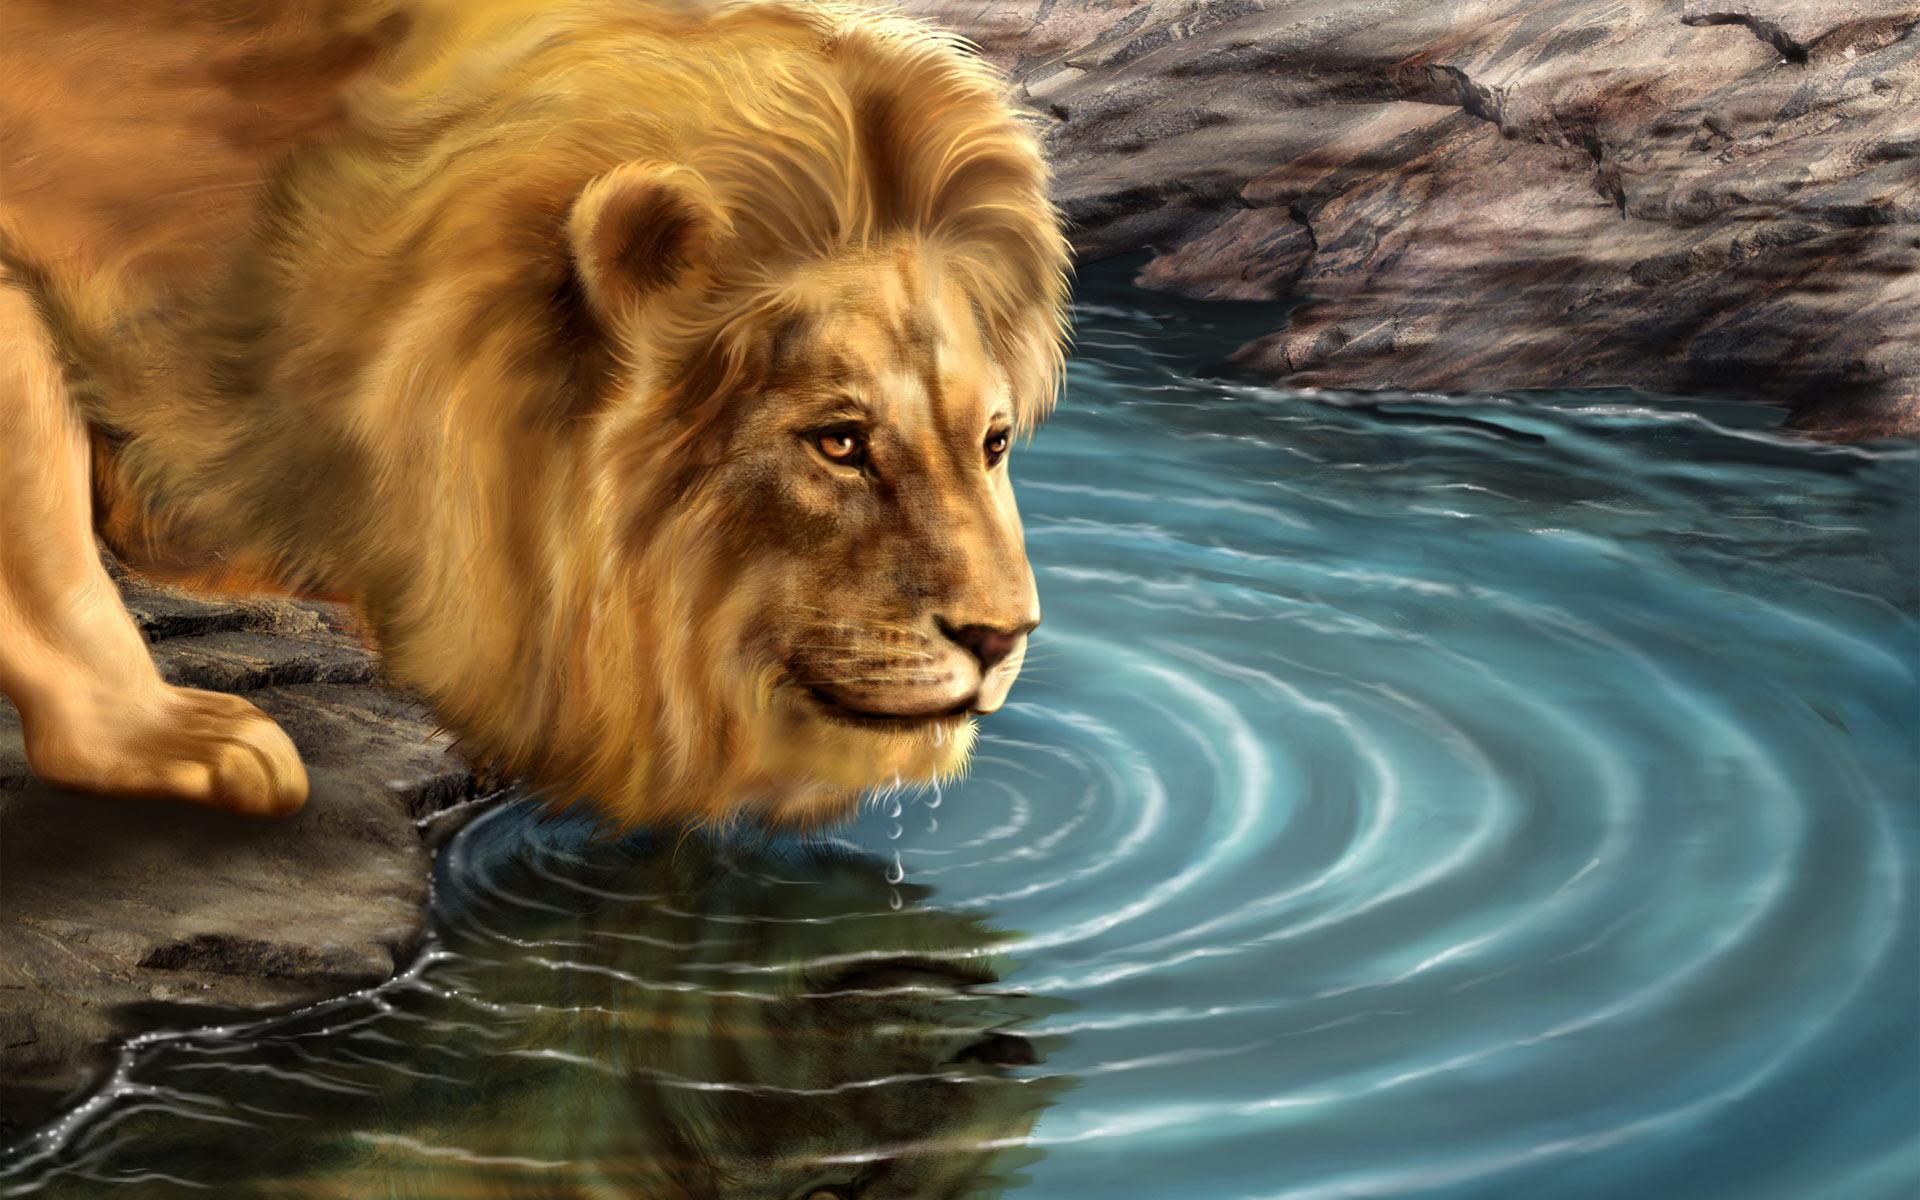 49 Free Lion Wallpaper Downloads On Wallpapersafari